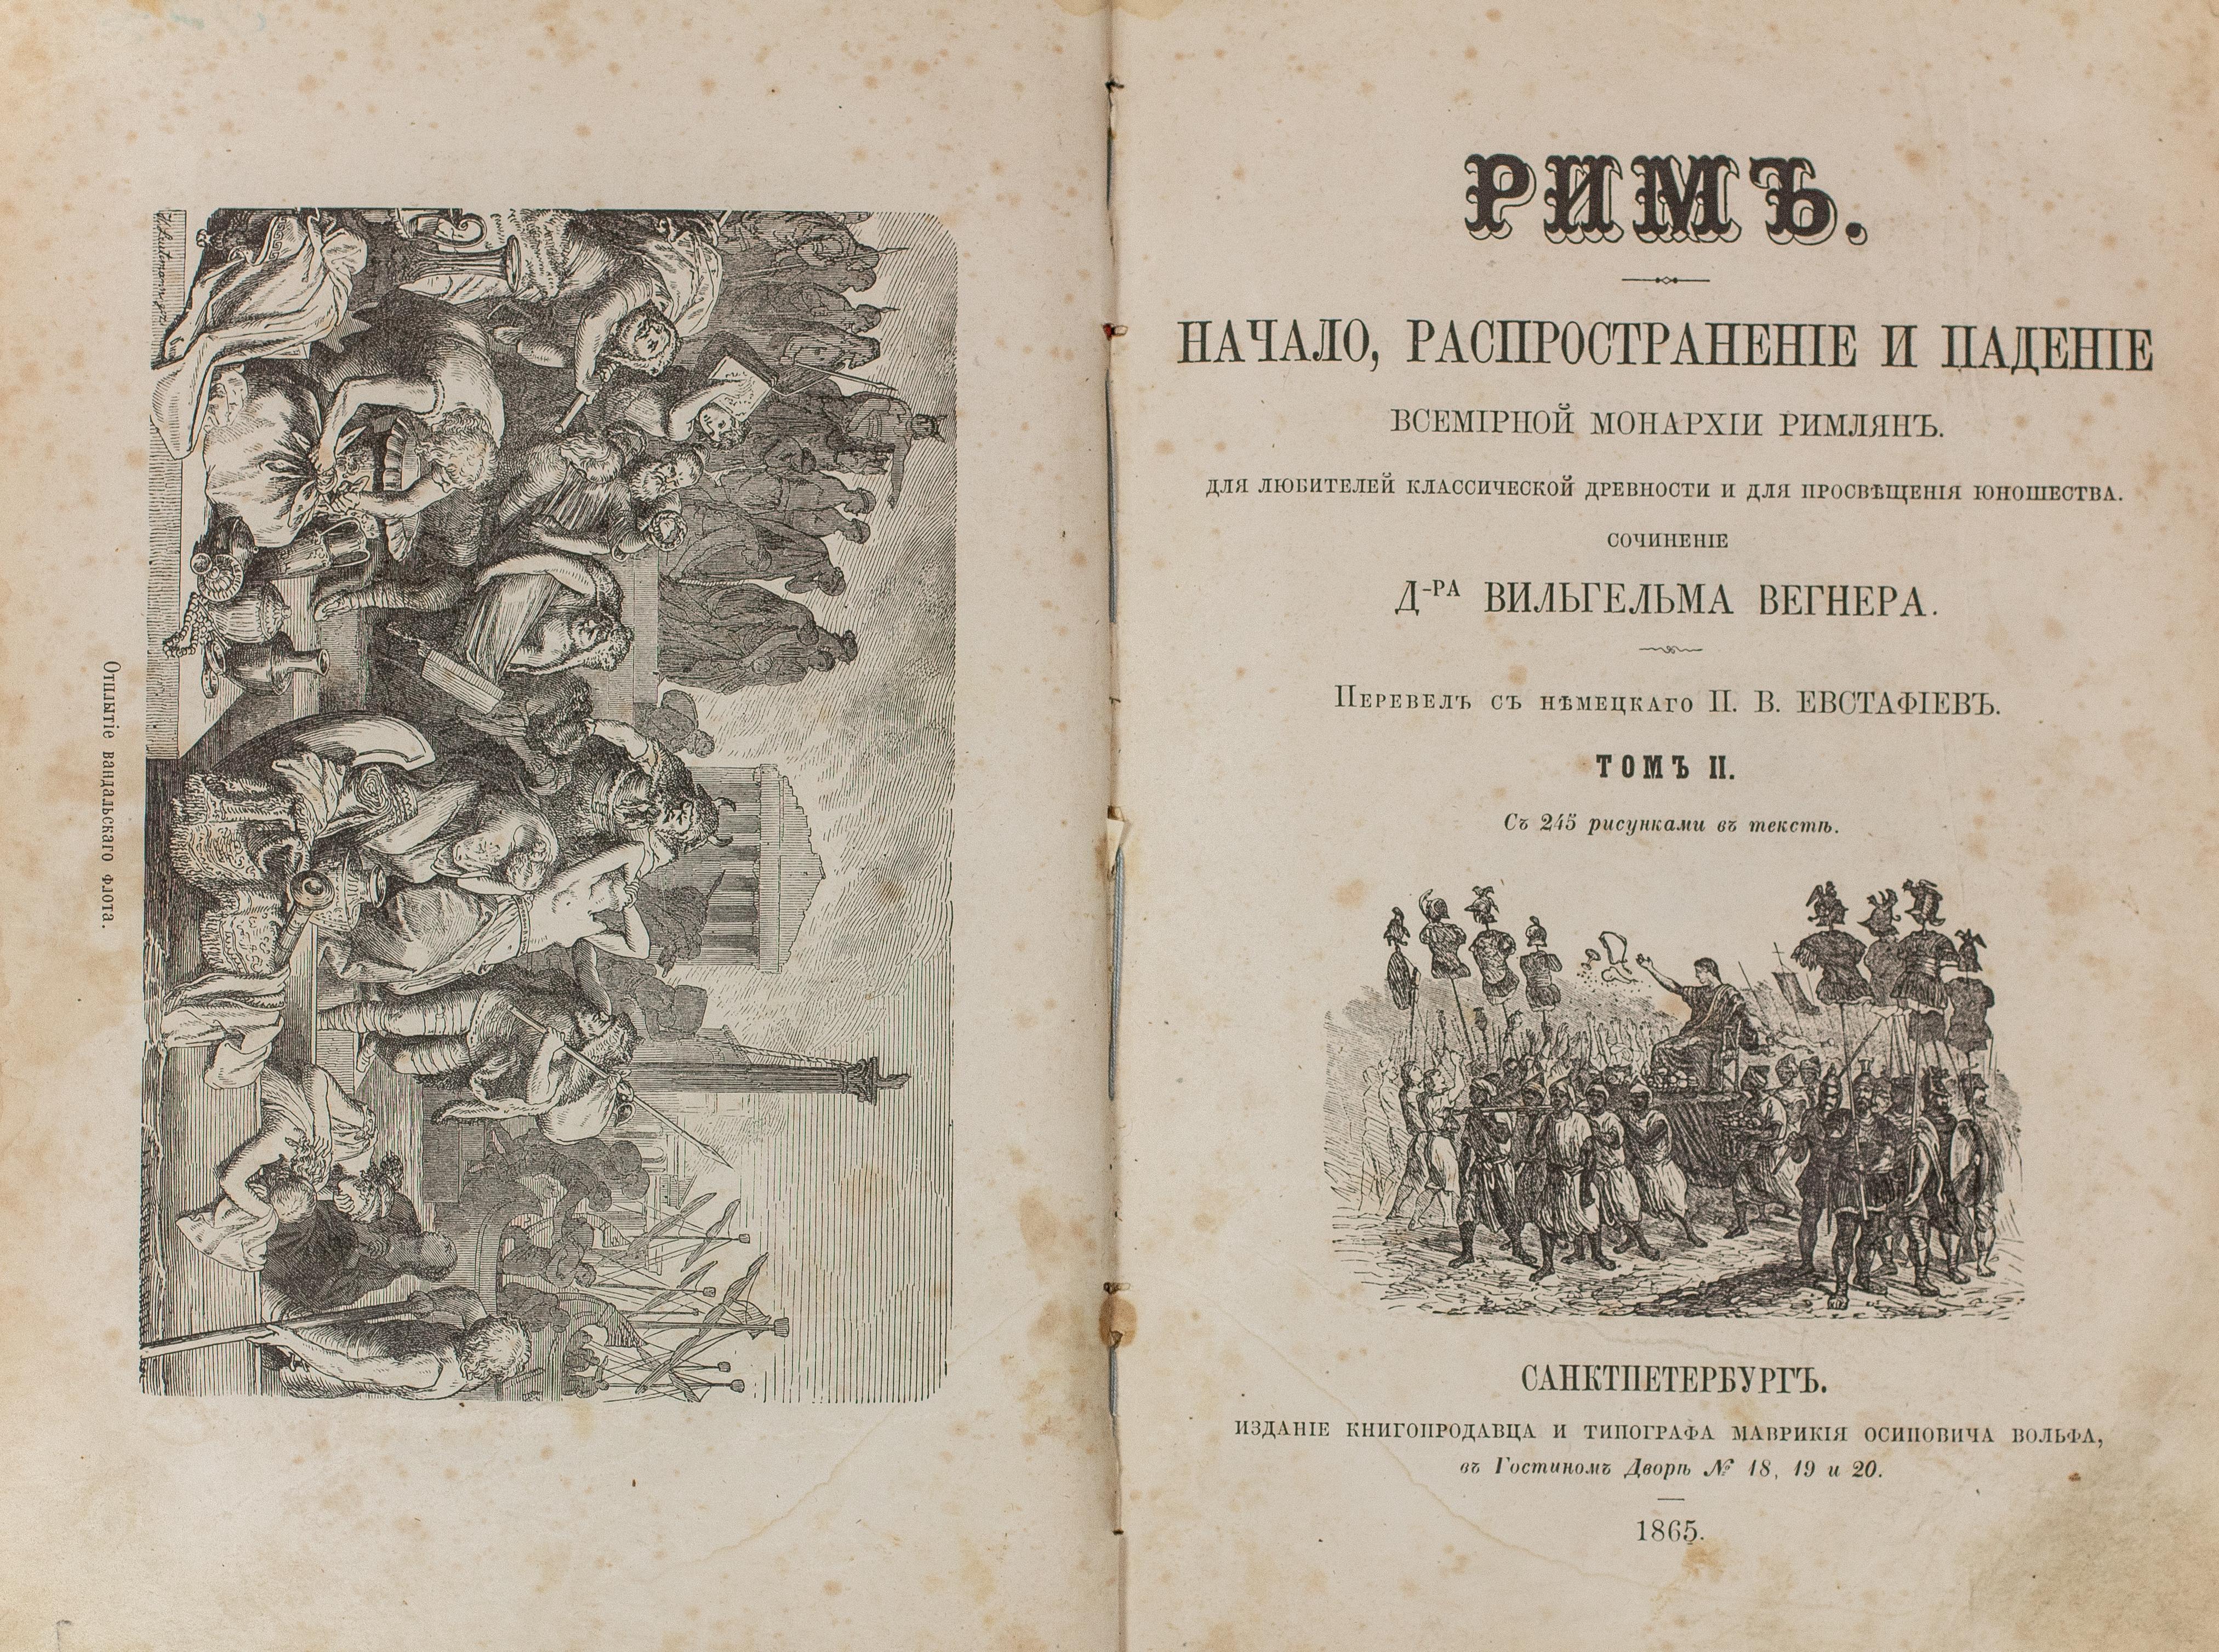 Lot 450 - WEGNER, Wilhelm. Histoire romaine. St.-Pétersbourg, chez M. Wolf, 1865. Tome 2 [...]